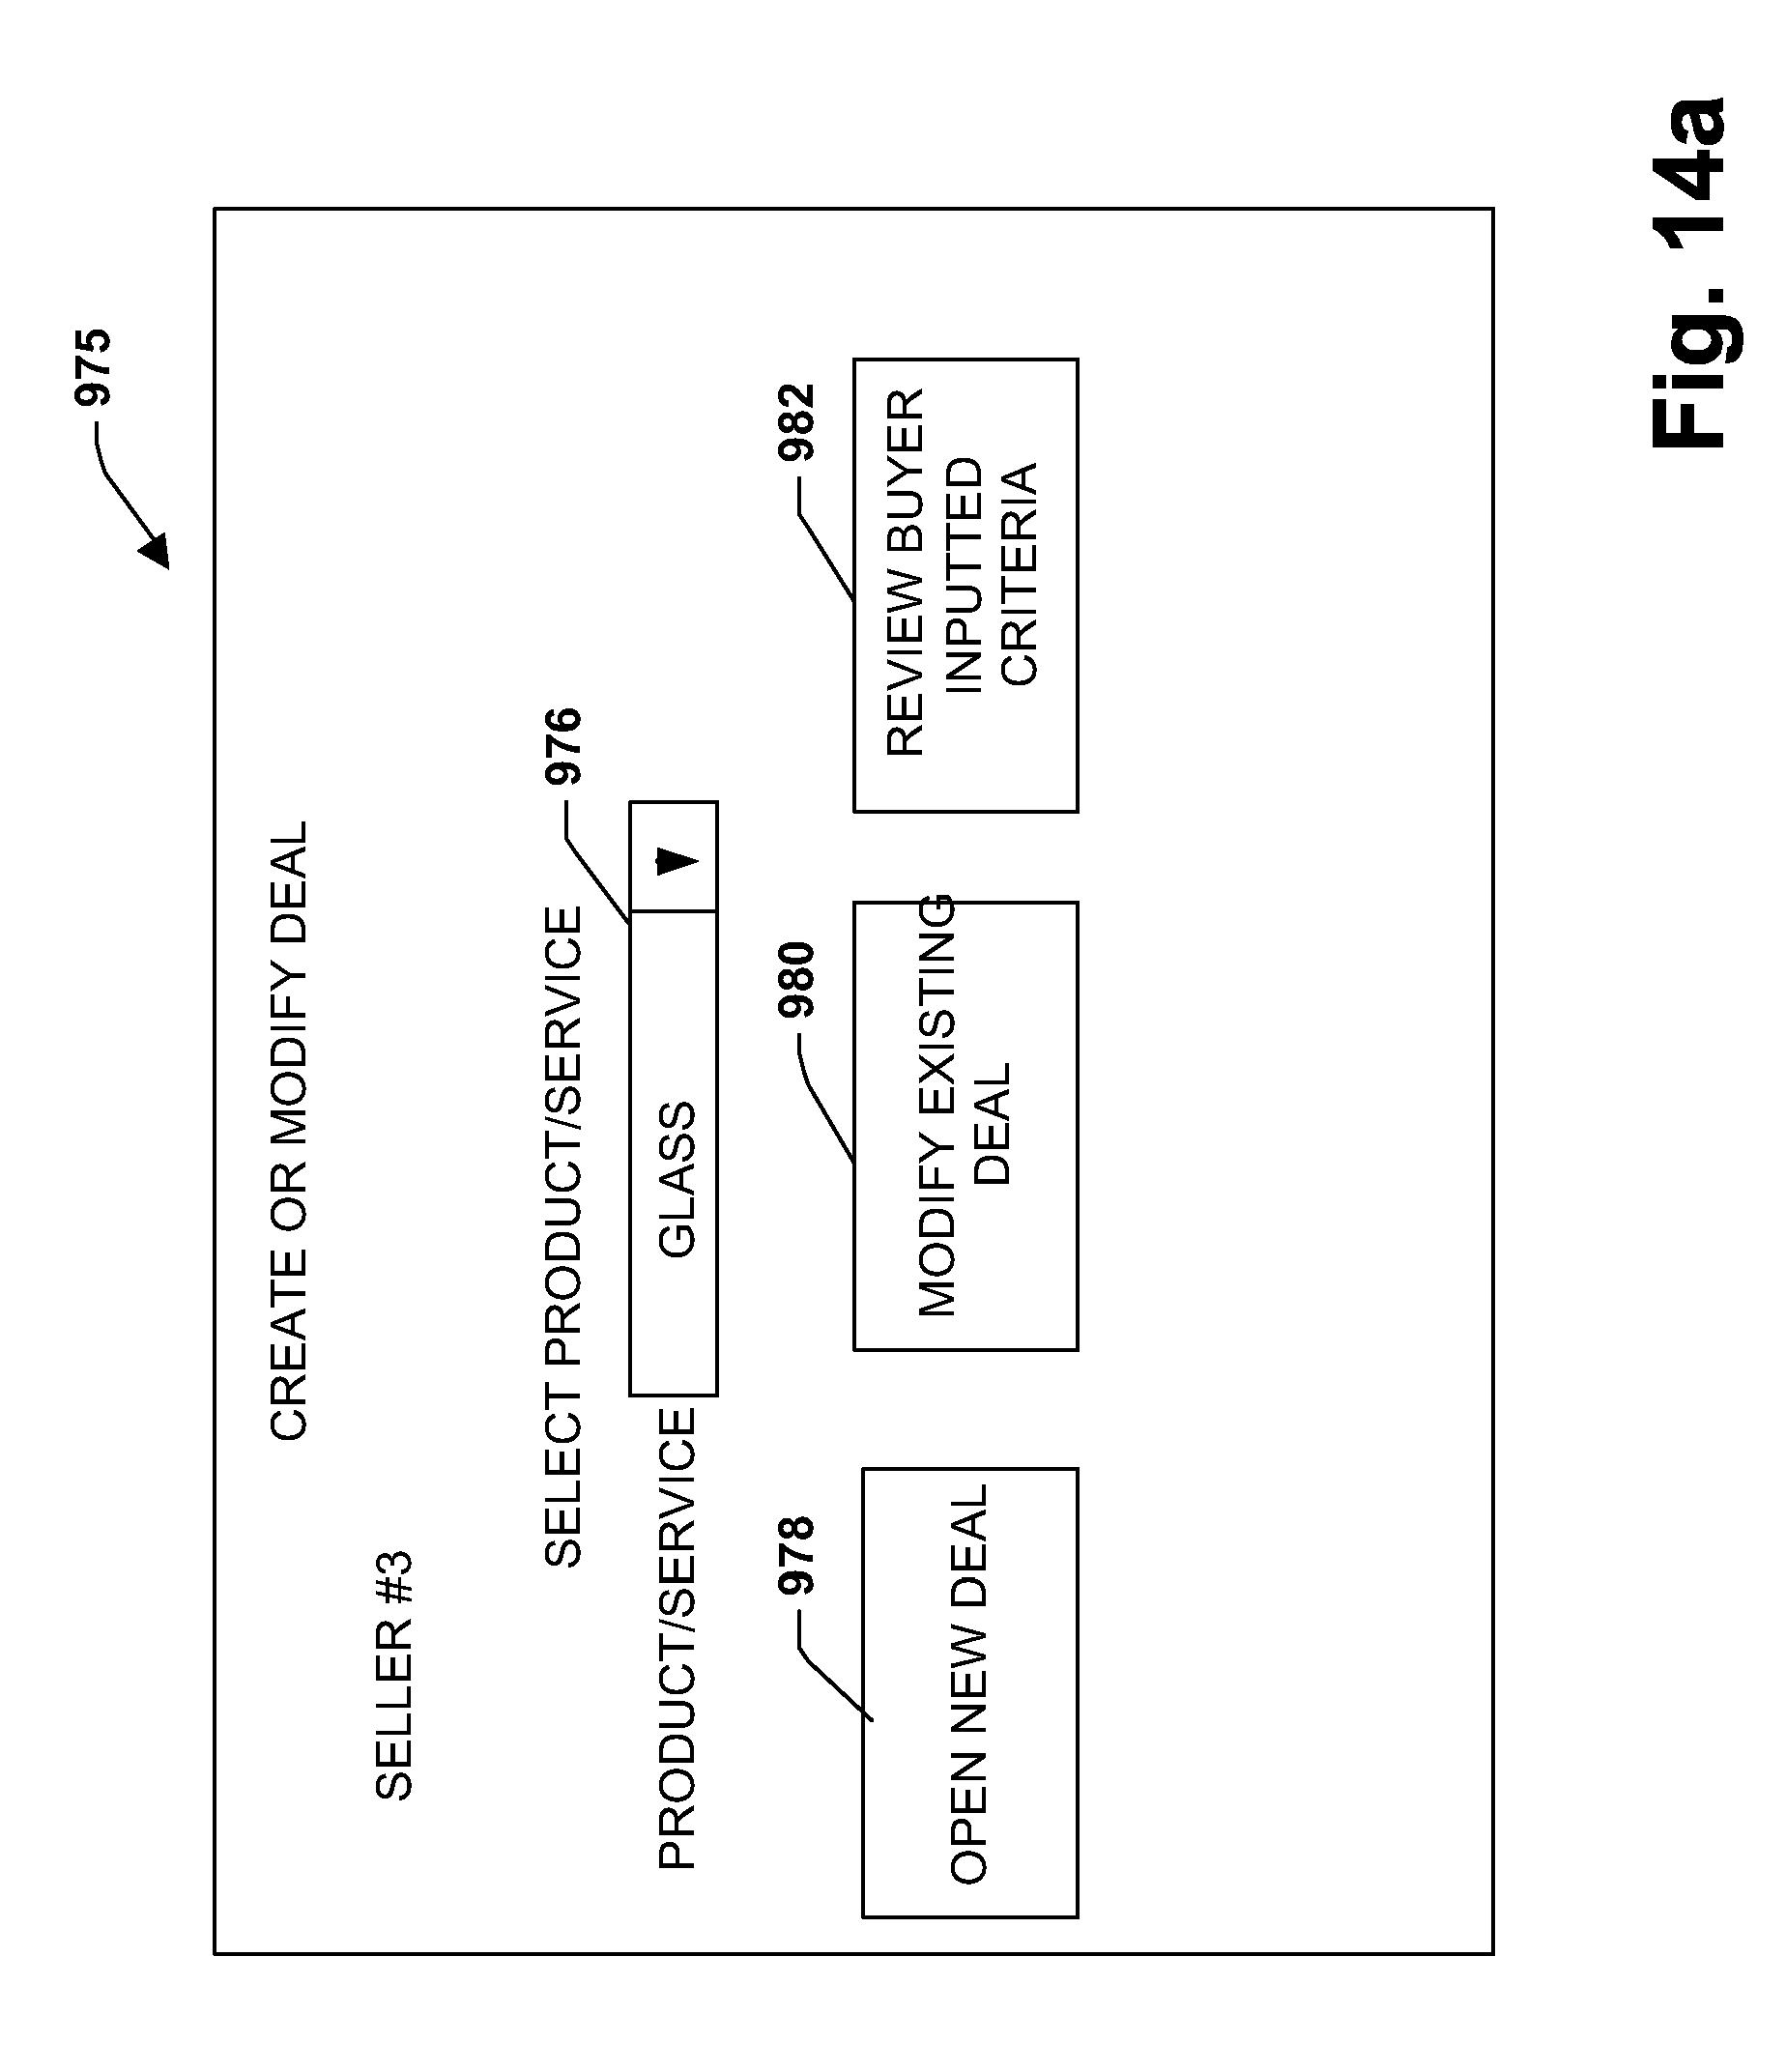 Patent US 8,616,449 B2